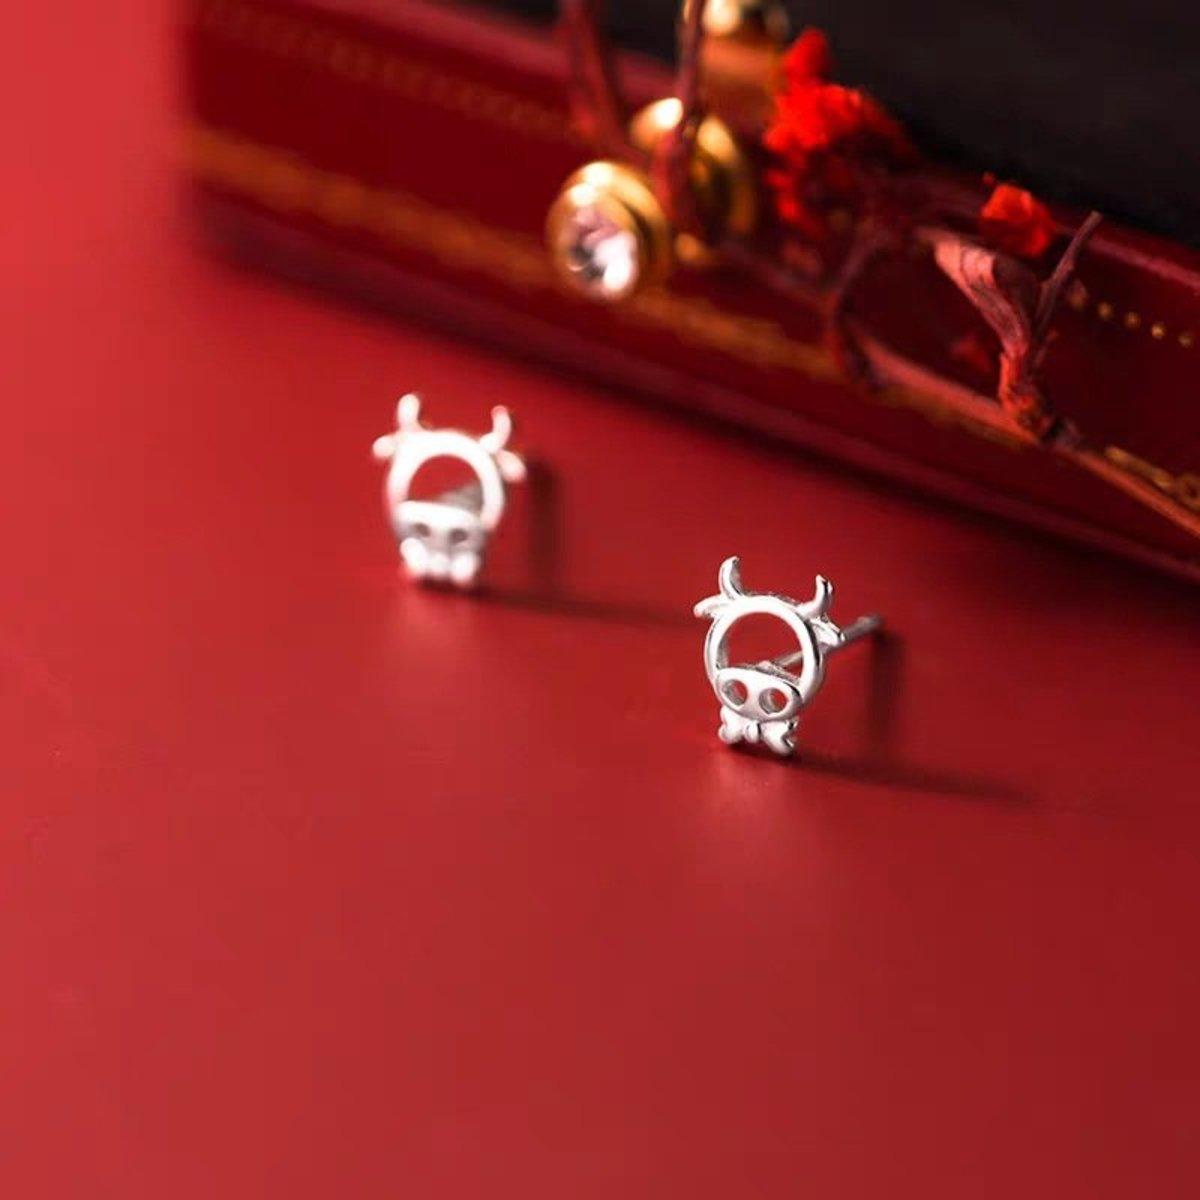 S925純銀日韓簡約防過敏耳釘耳環(十二生肖牛牛)